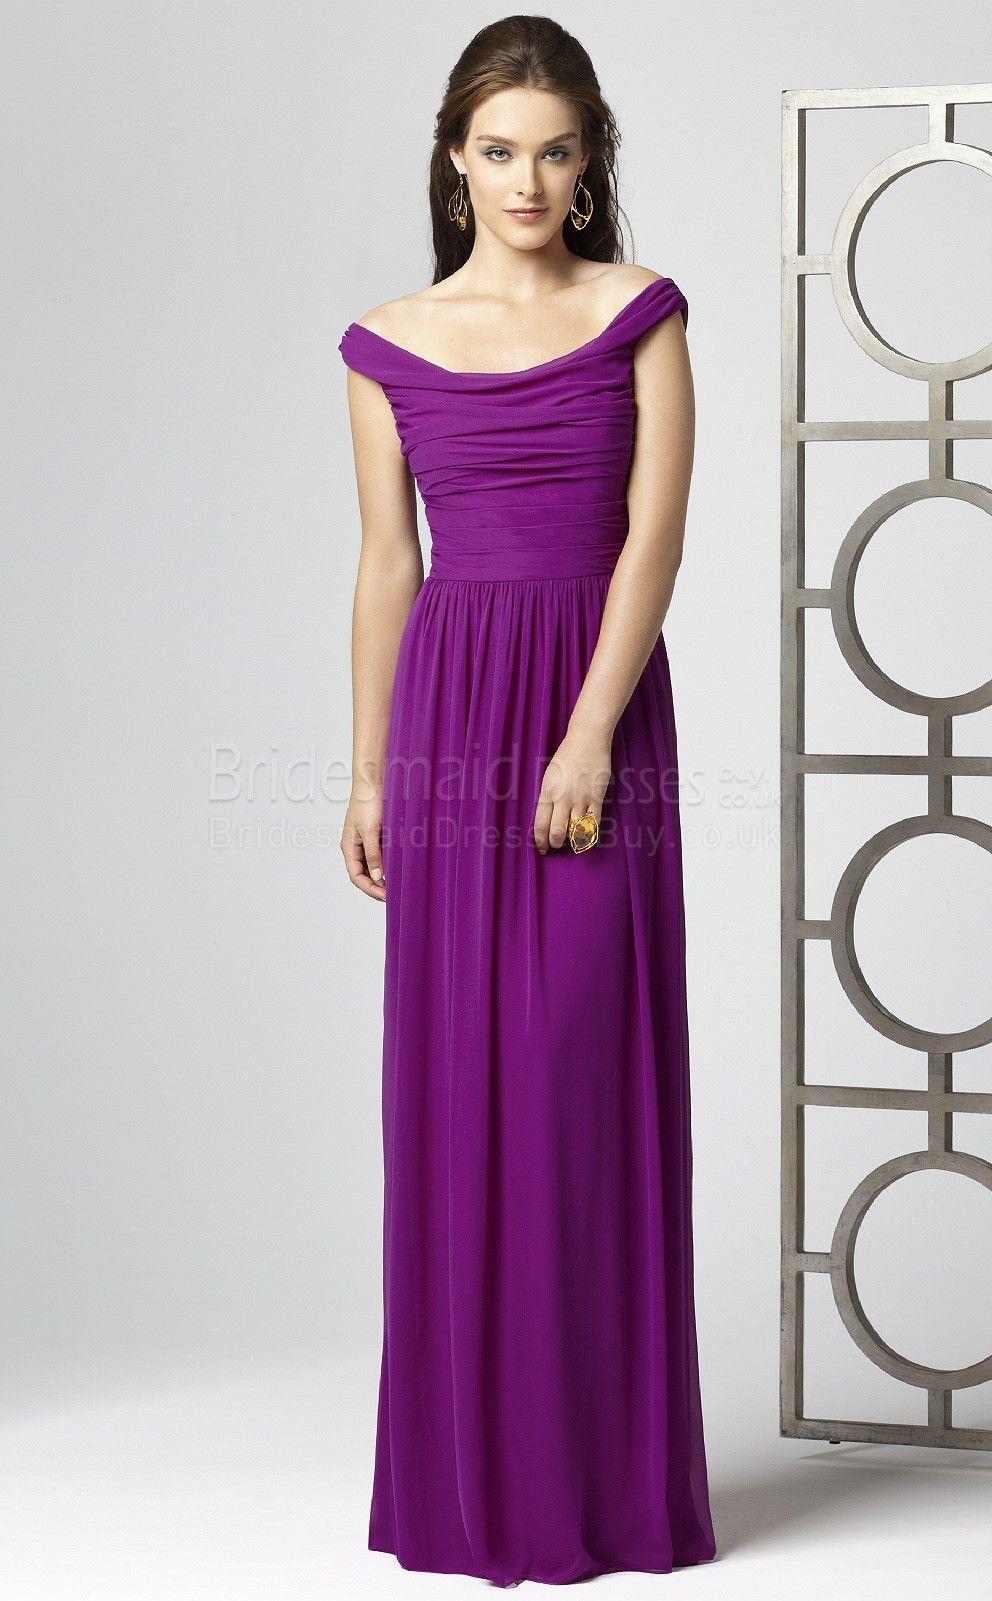 purple bridesmaid dresses   Gia   Pinterest